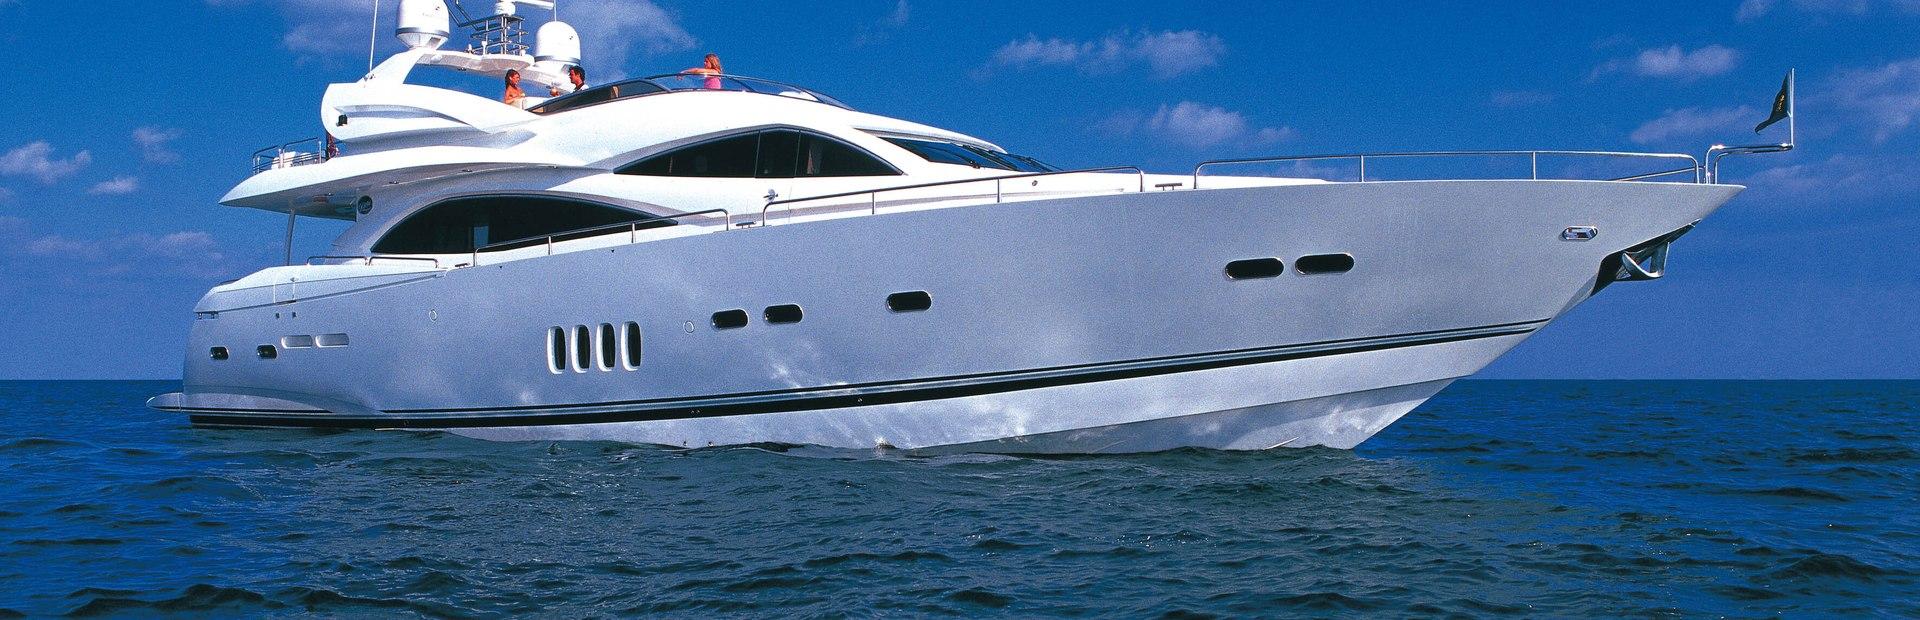 Sunseeker 90 Yacht Yacht Charter